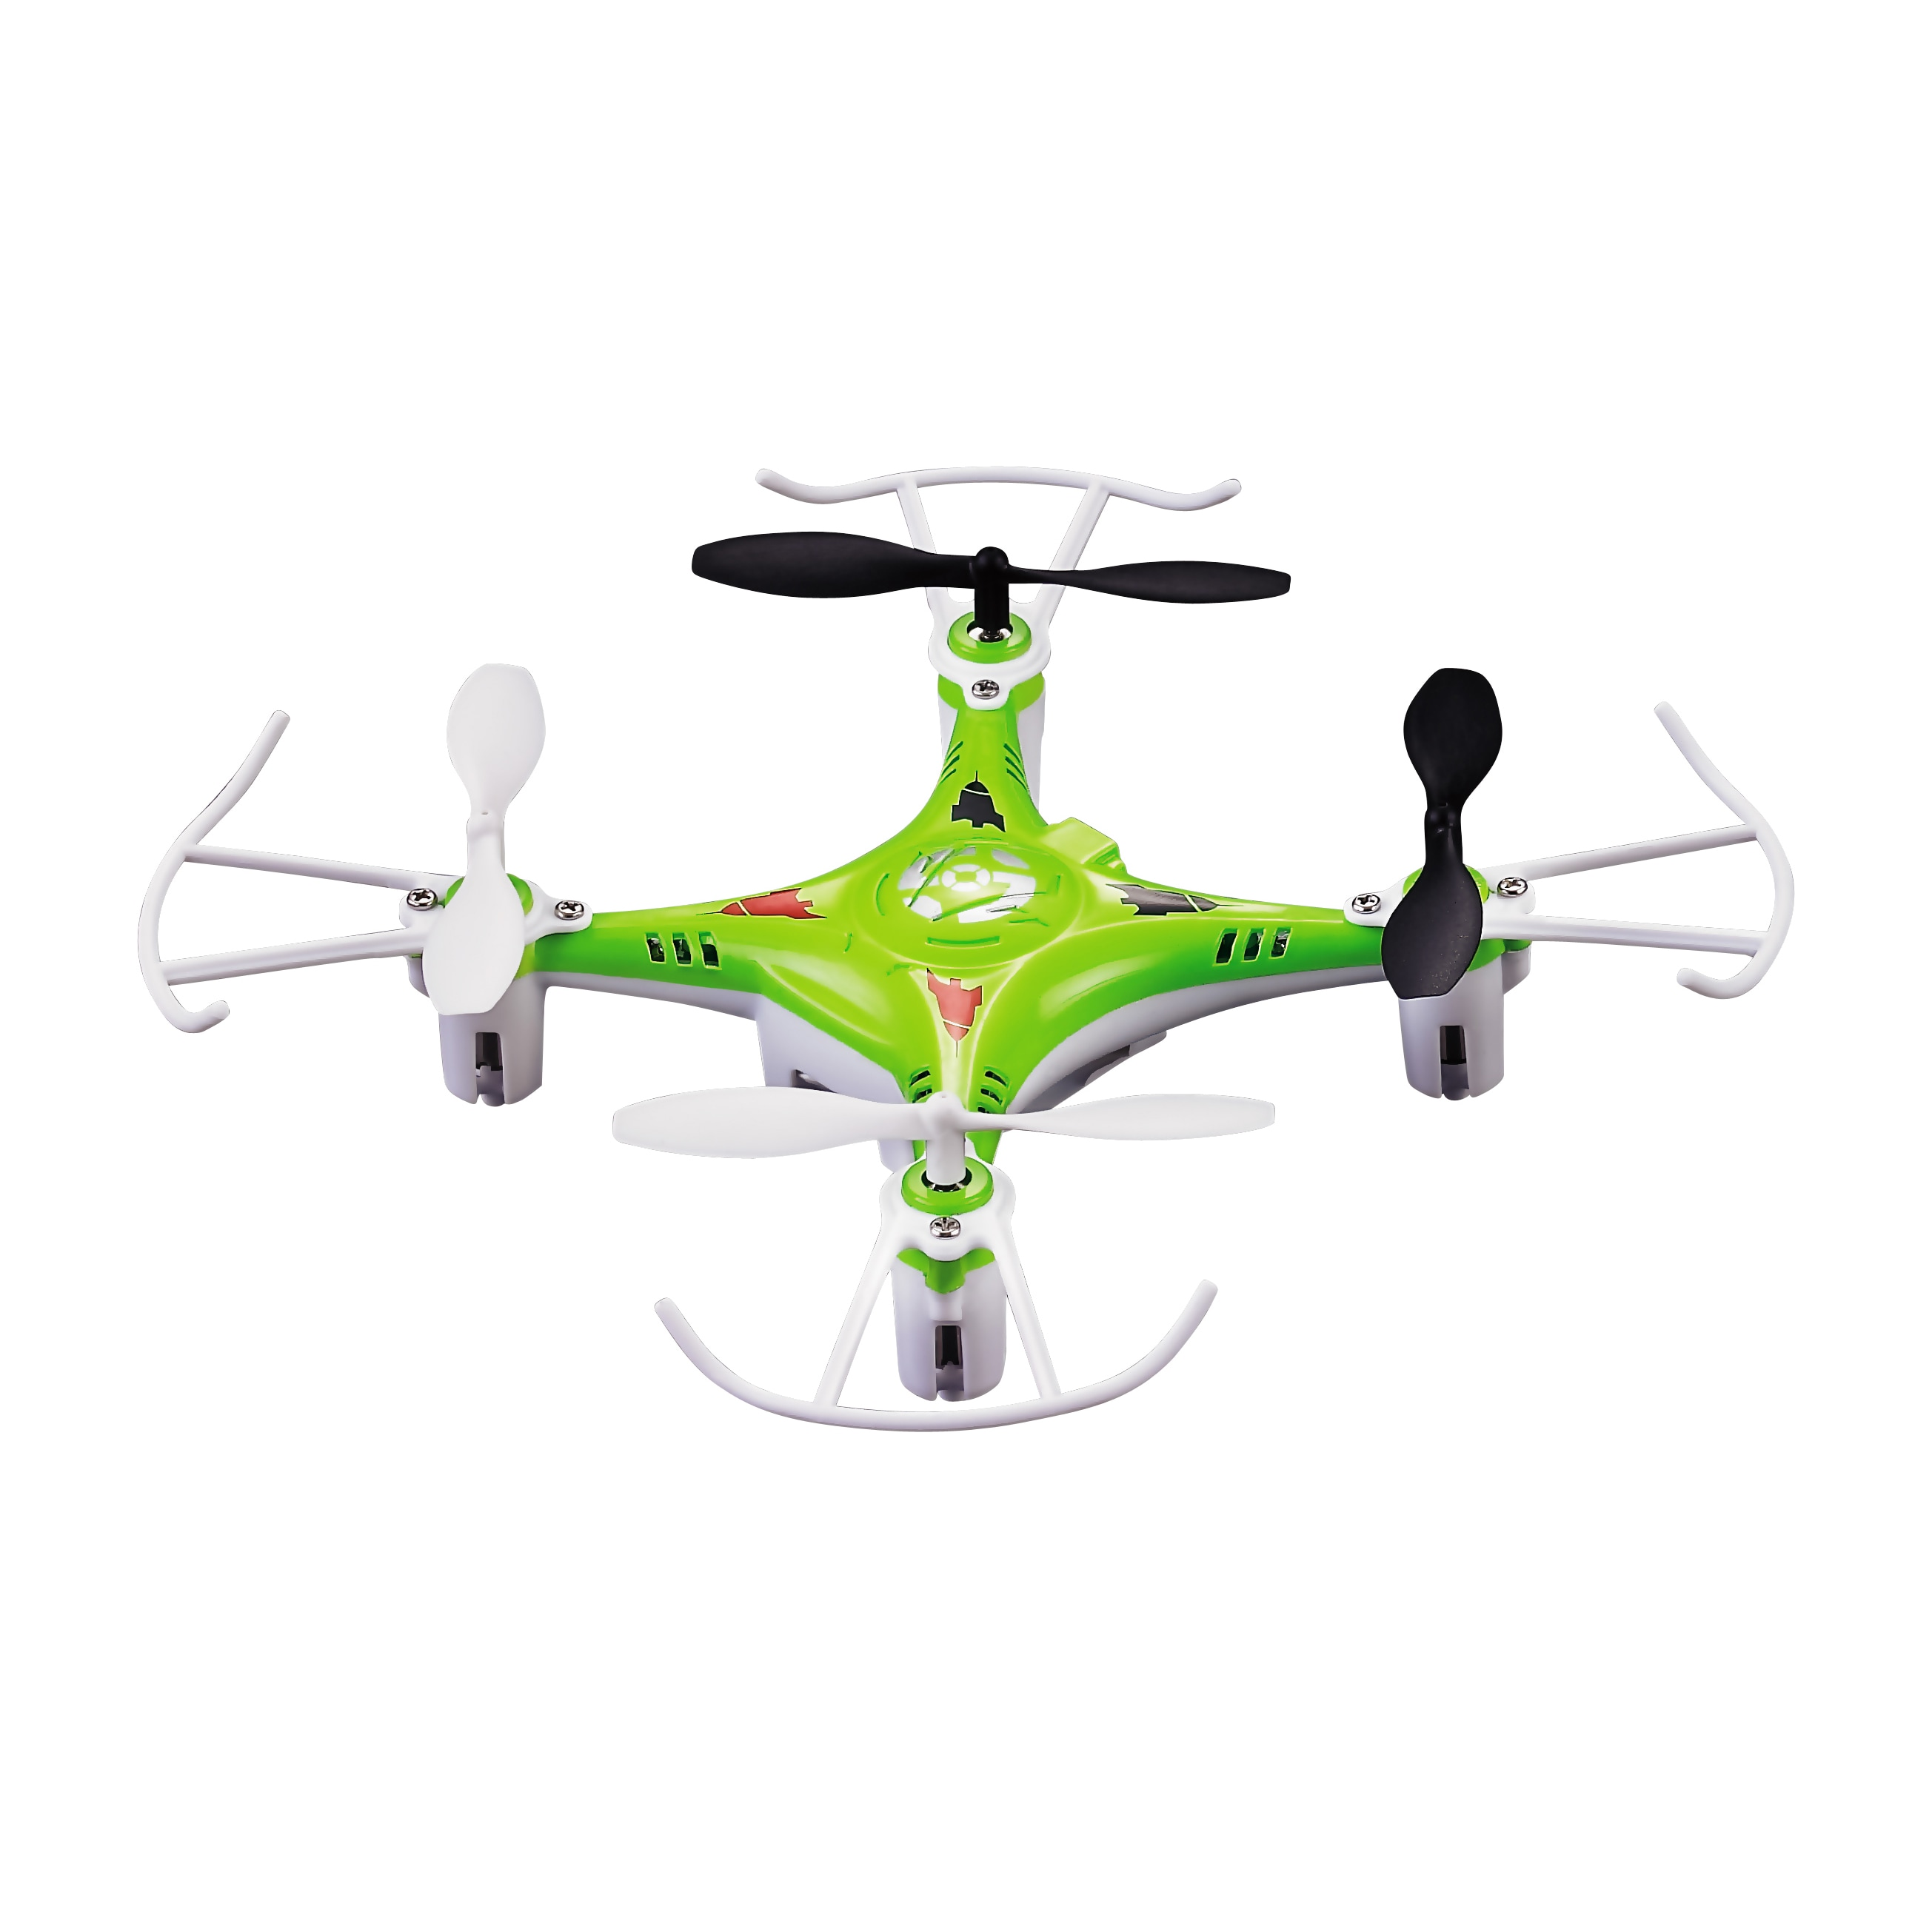 SEAICH 2.4G 4-CH RC Quadcopter with Headless Mode X7 (Green)